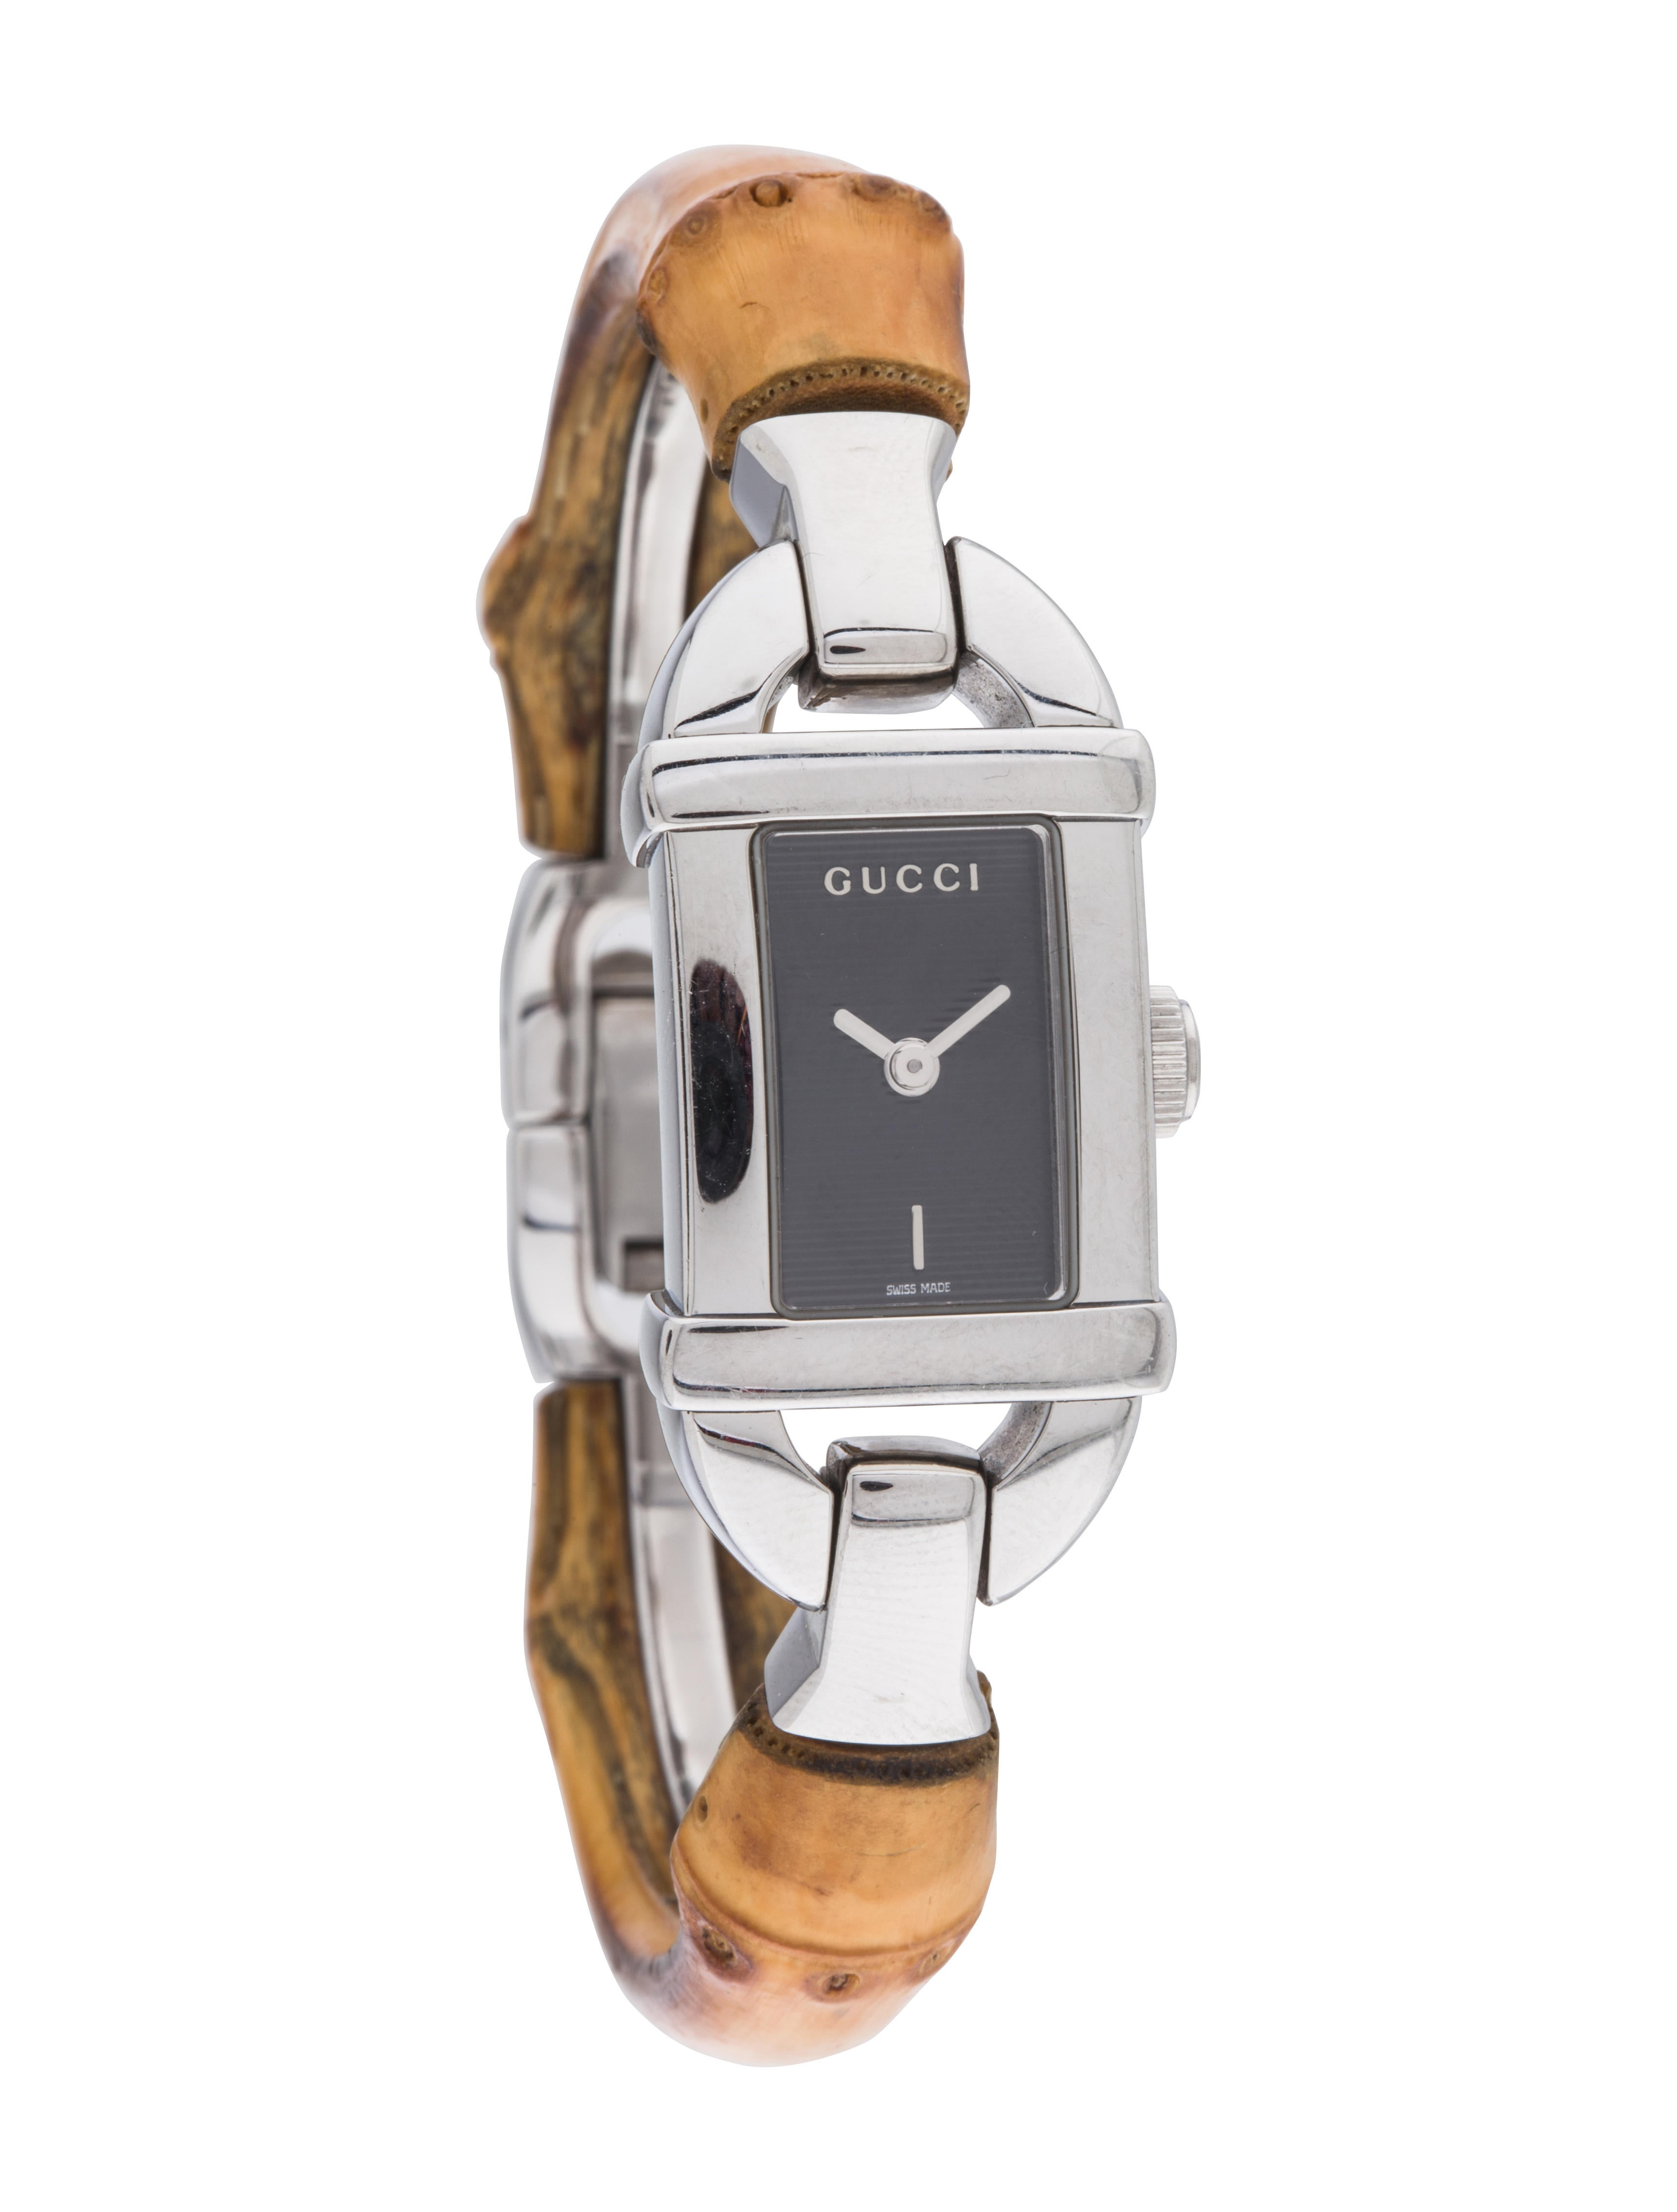 3a0bf10722a Gucci 6800L Bamboo Watch - Bracelet - GUC180945